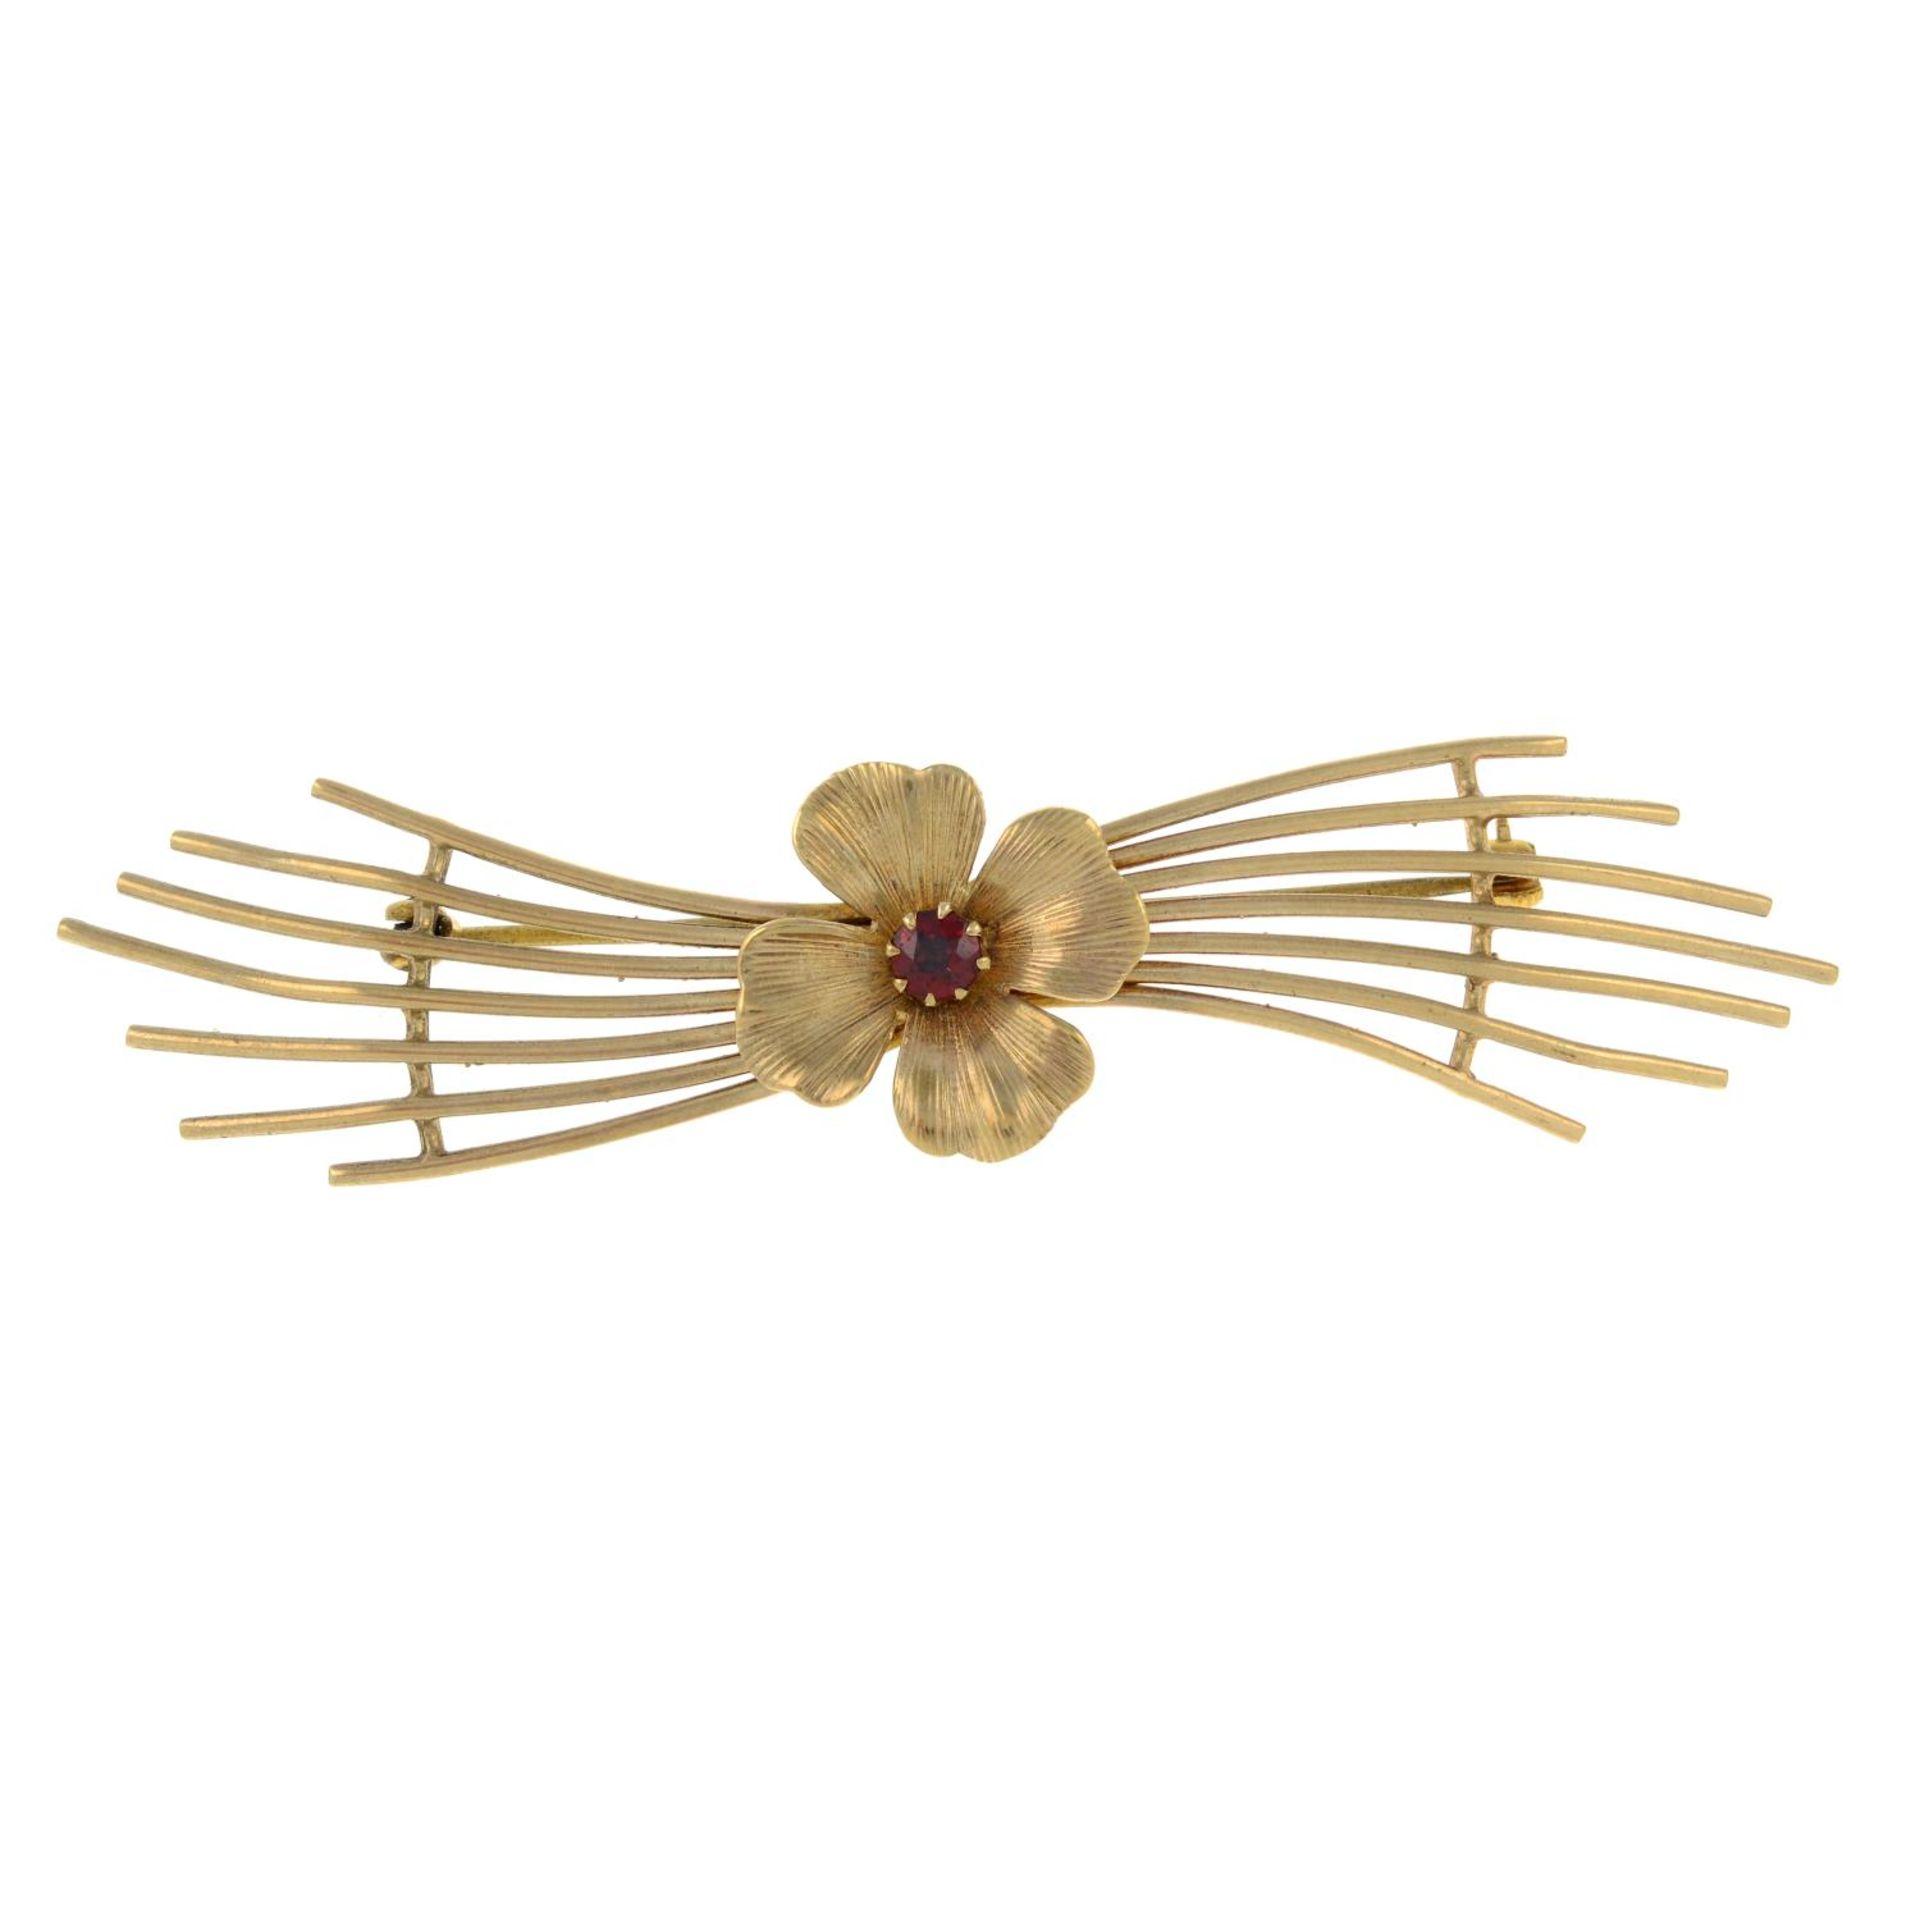 A 9ct gold garnet stylised flower brooch.Hallmarks for 9ct gold.